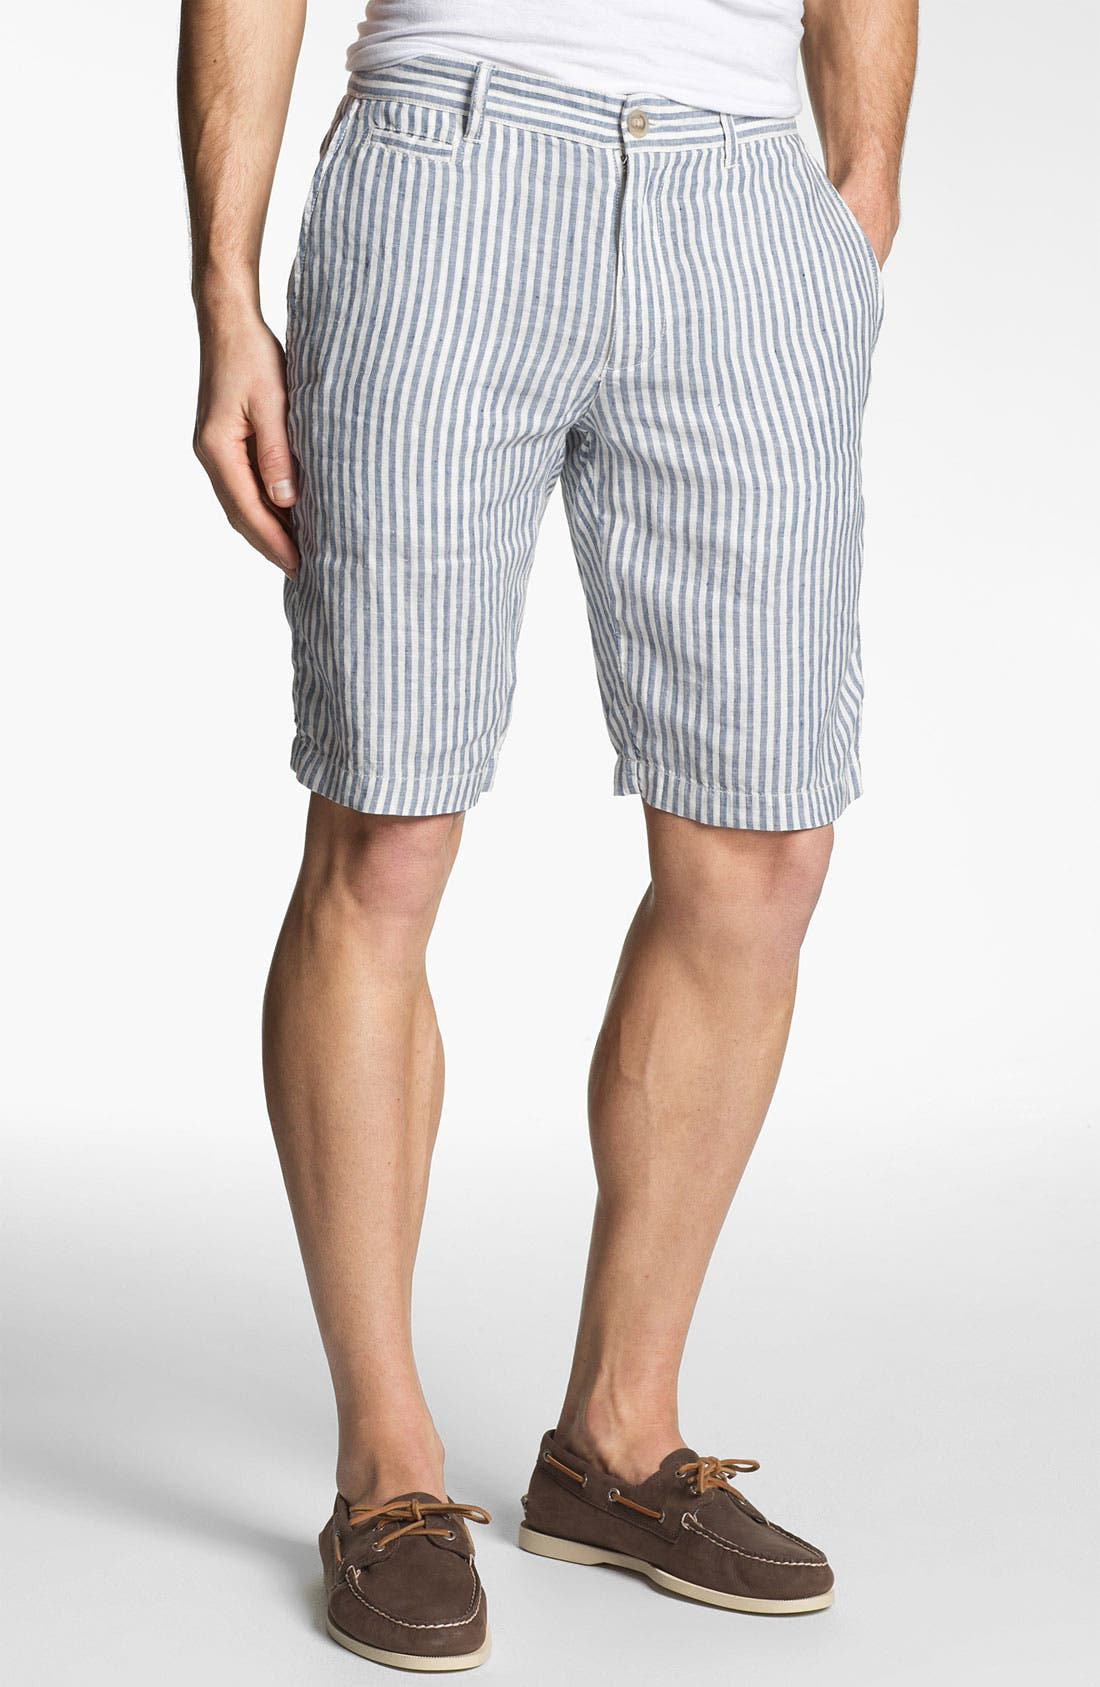 Alternate Image 1 Selected - 1901 'Eastport' Linen Shorts